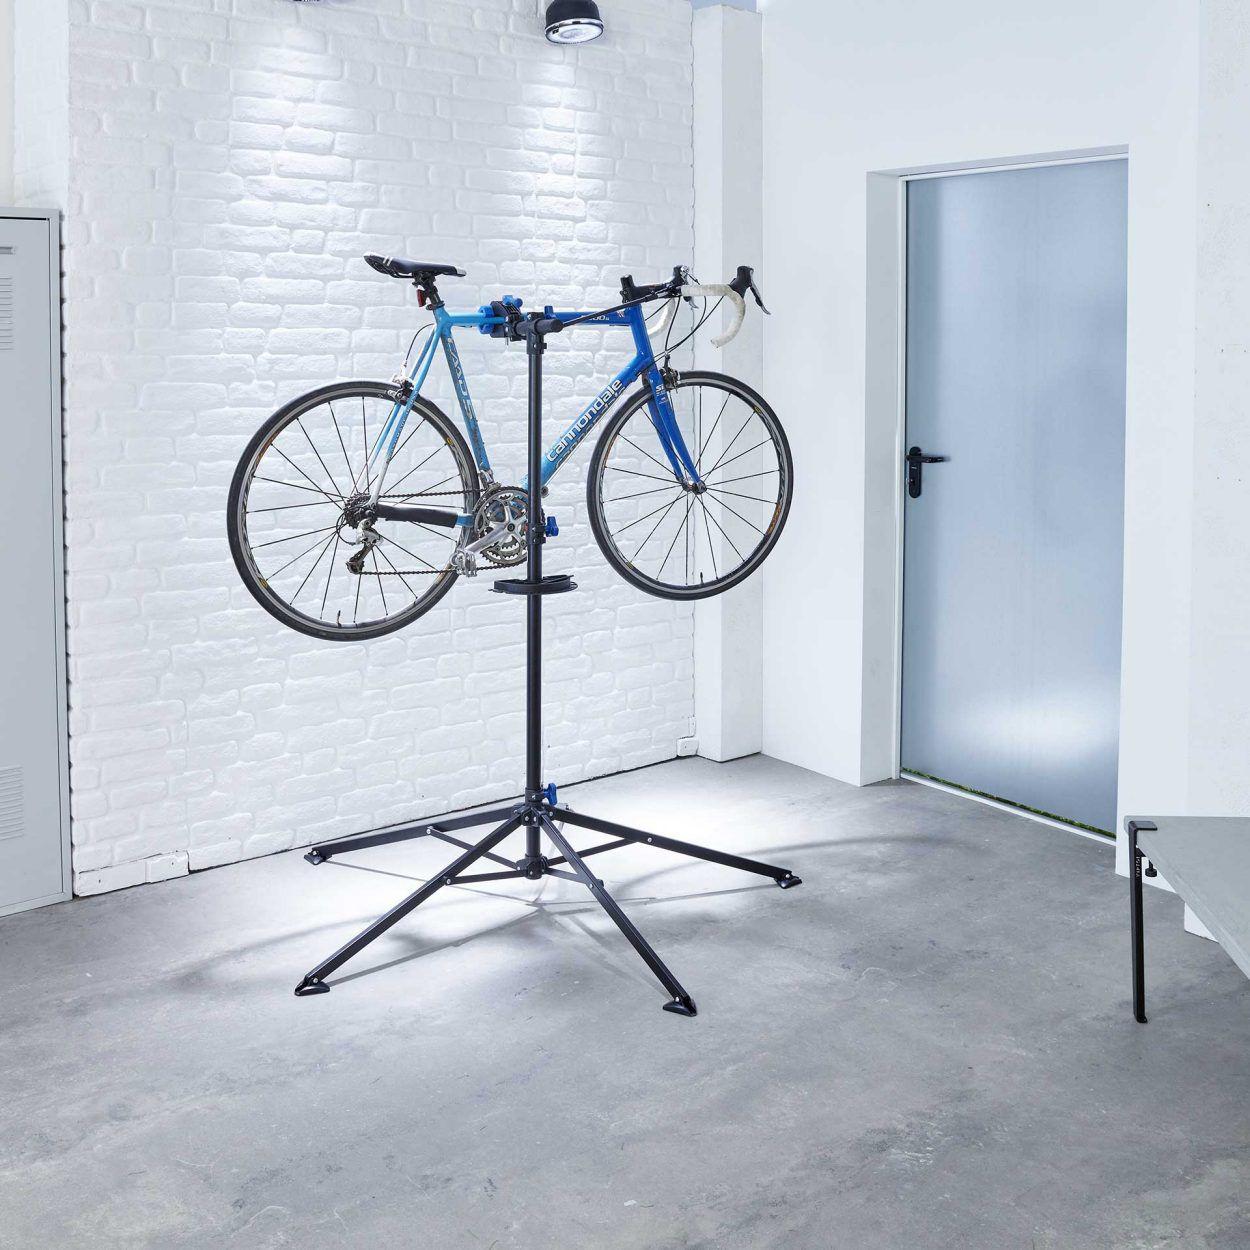 Support de réparation vélo Cyclemaster